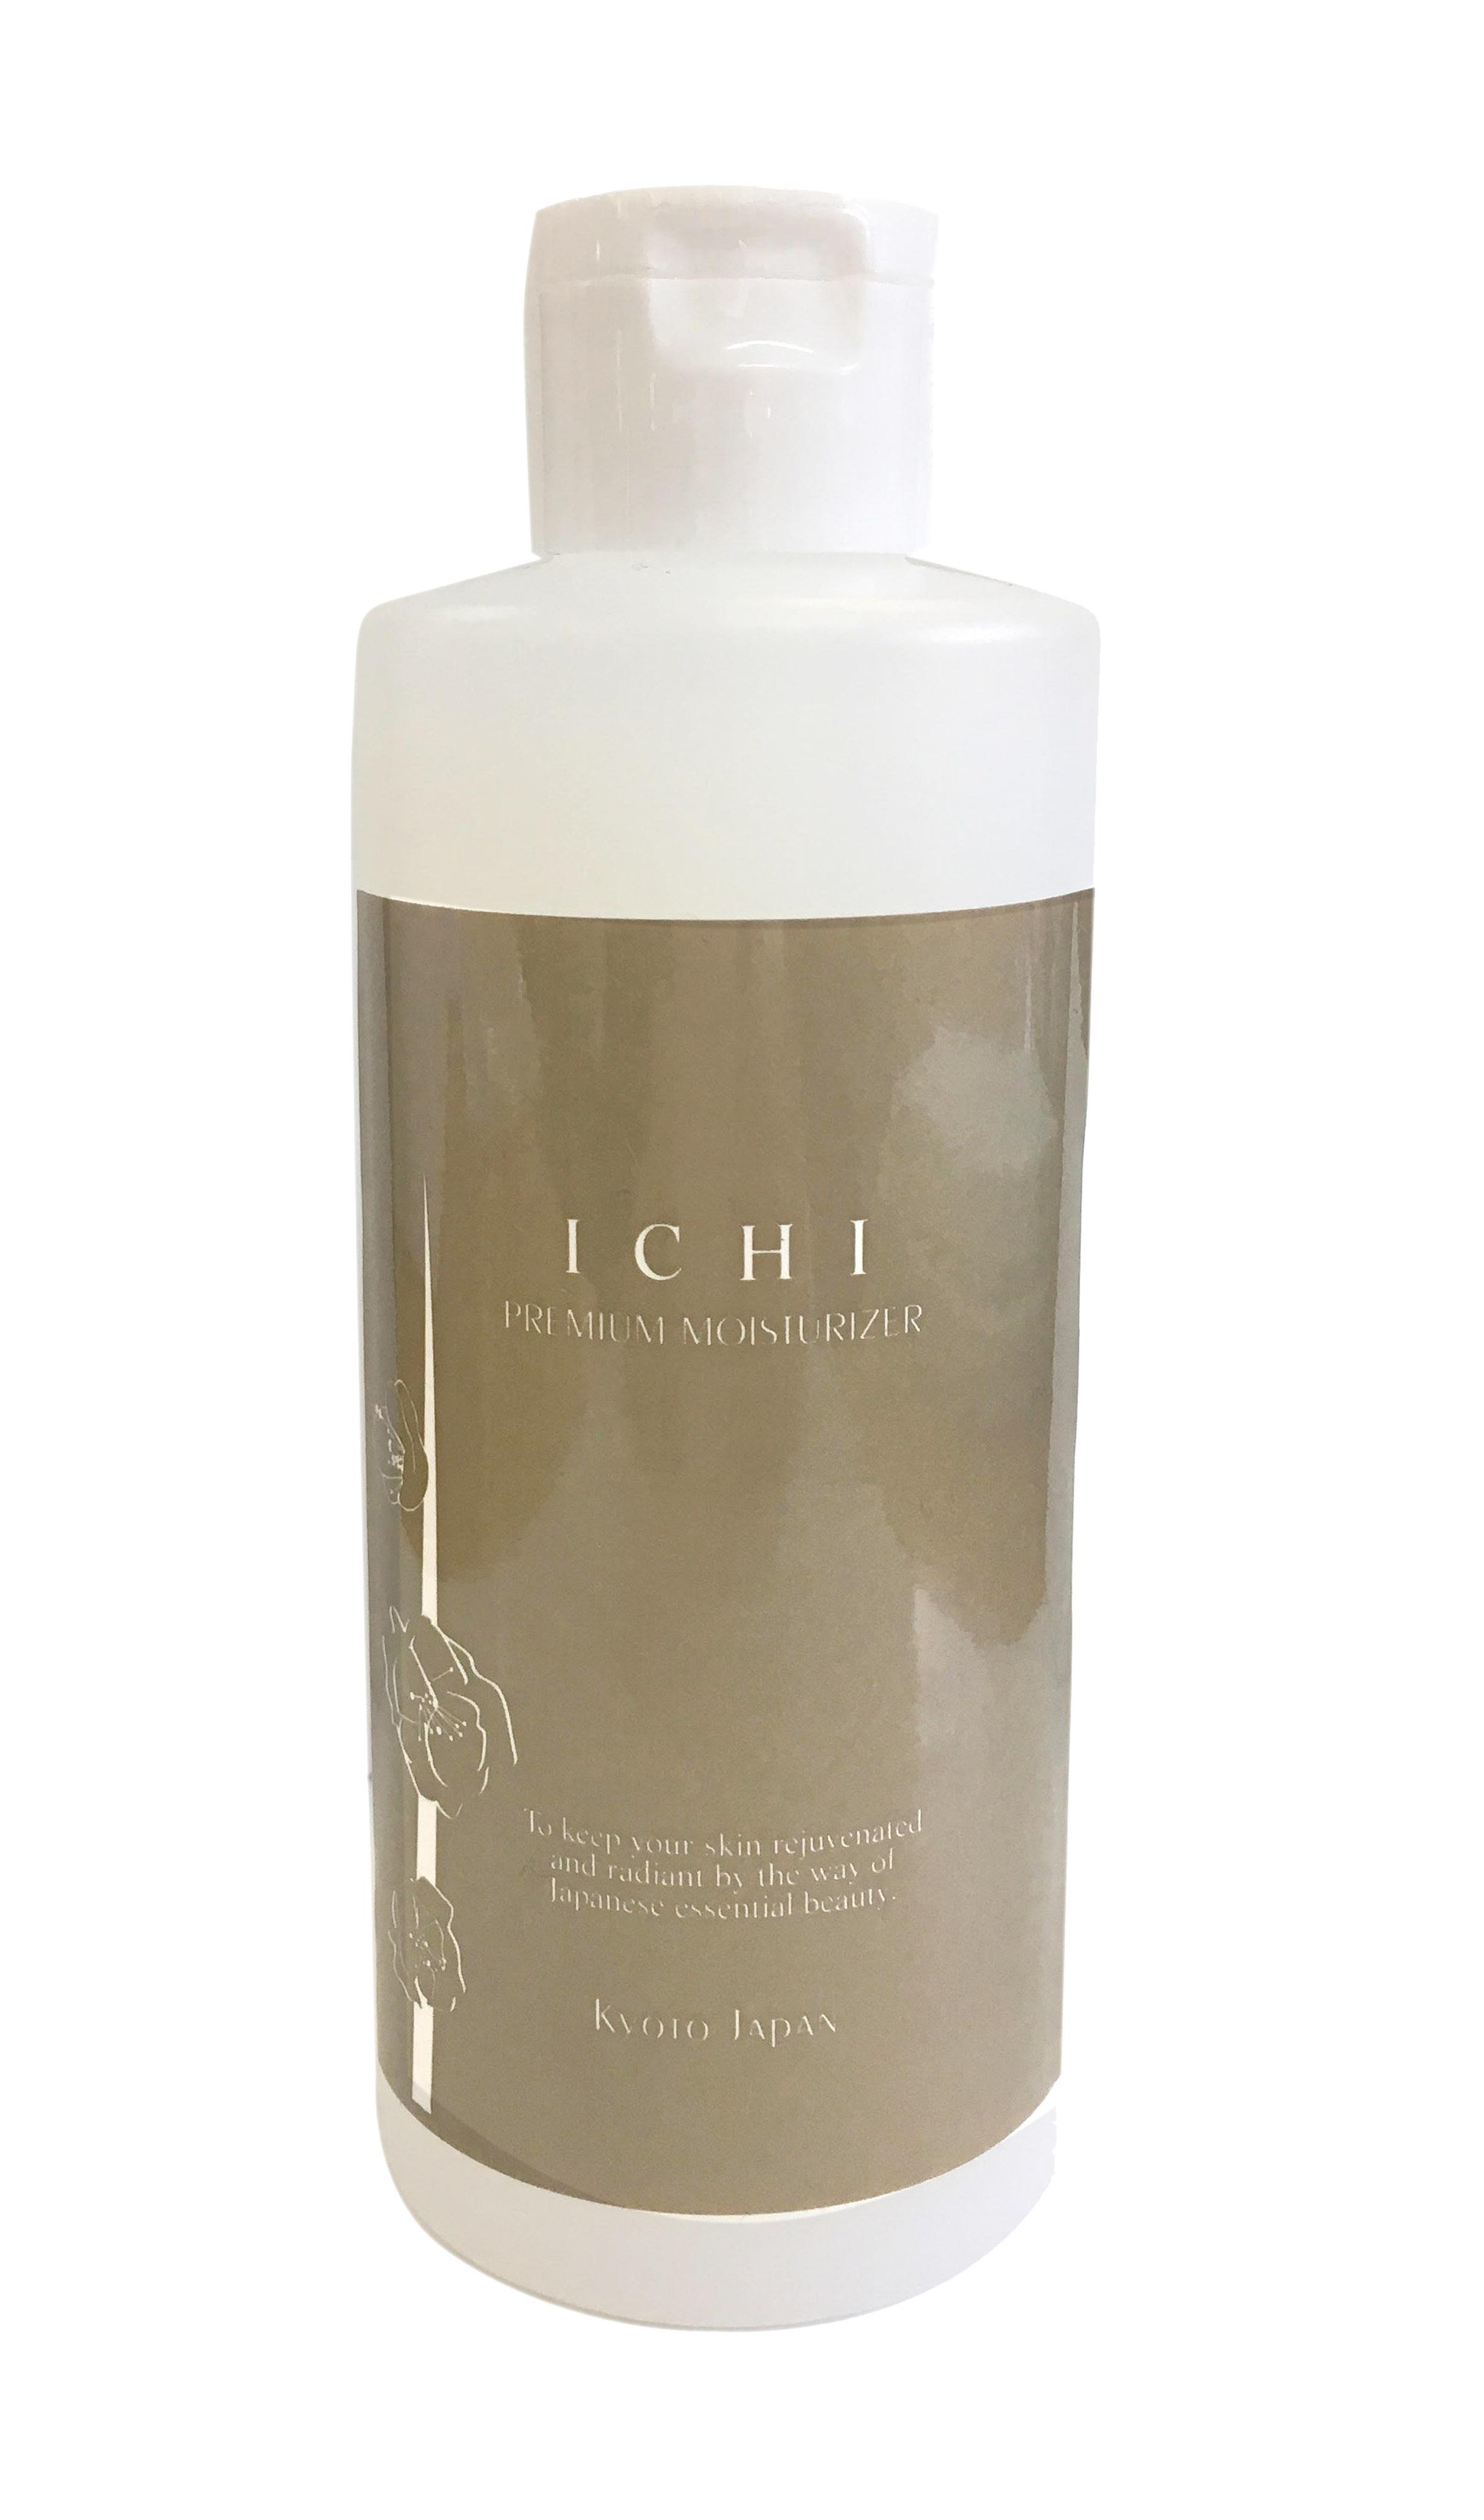 ICHIプレミアムモイスチャライザー200mL:Premium moisturizer 定価12,800円(税抜)⇒【約15%OFF 10,800円】